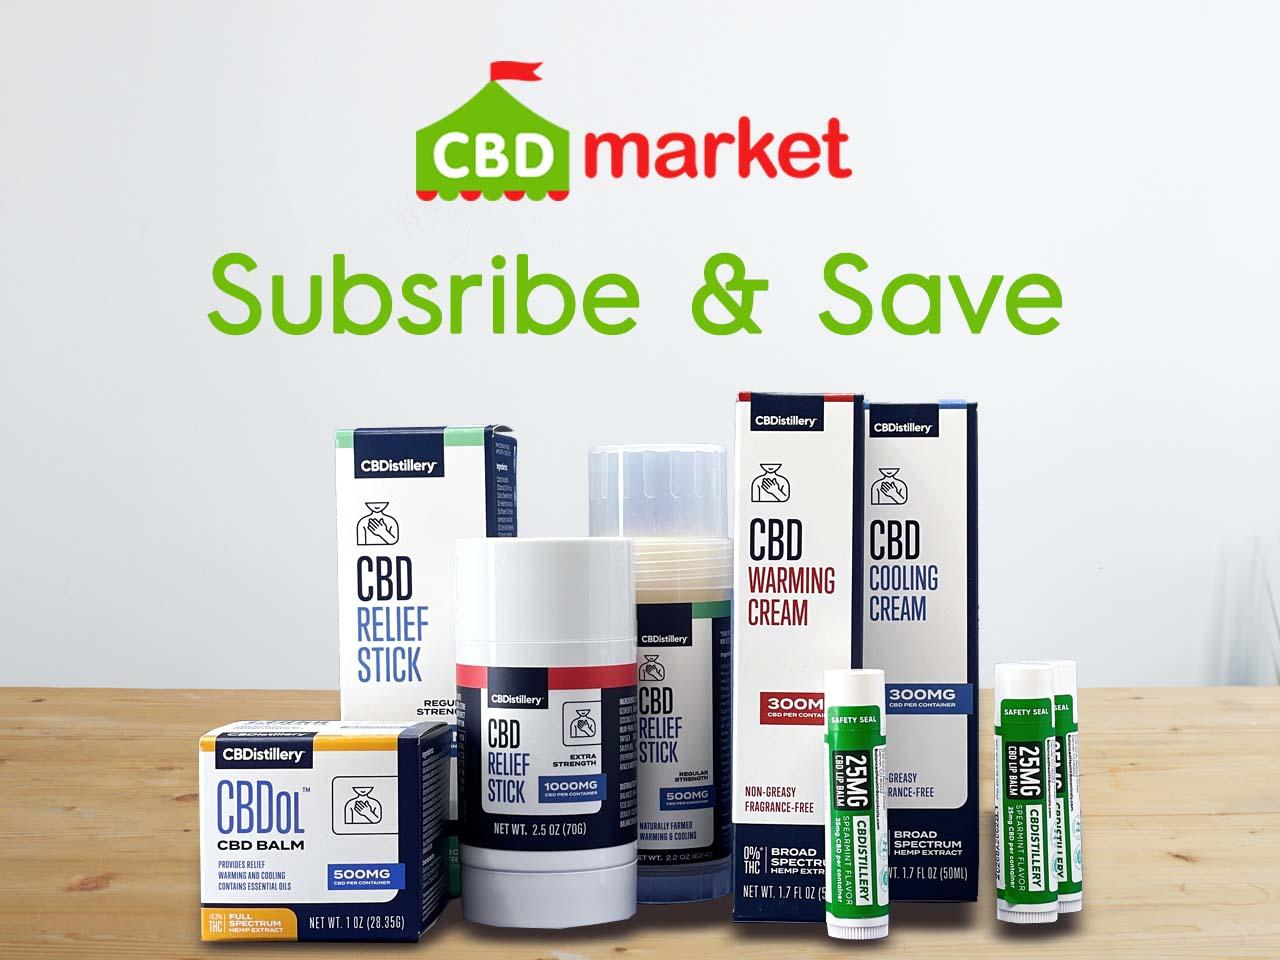 CBD.market CBD Online Store Announces CBD Subscription Service That Saves Customers Money